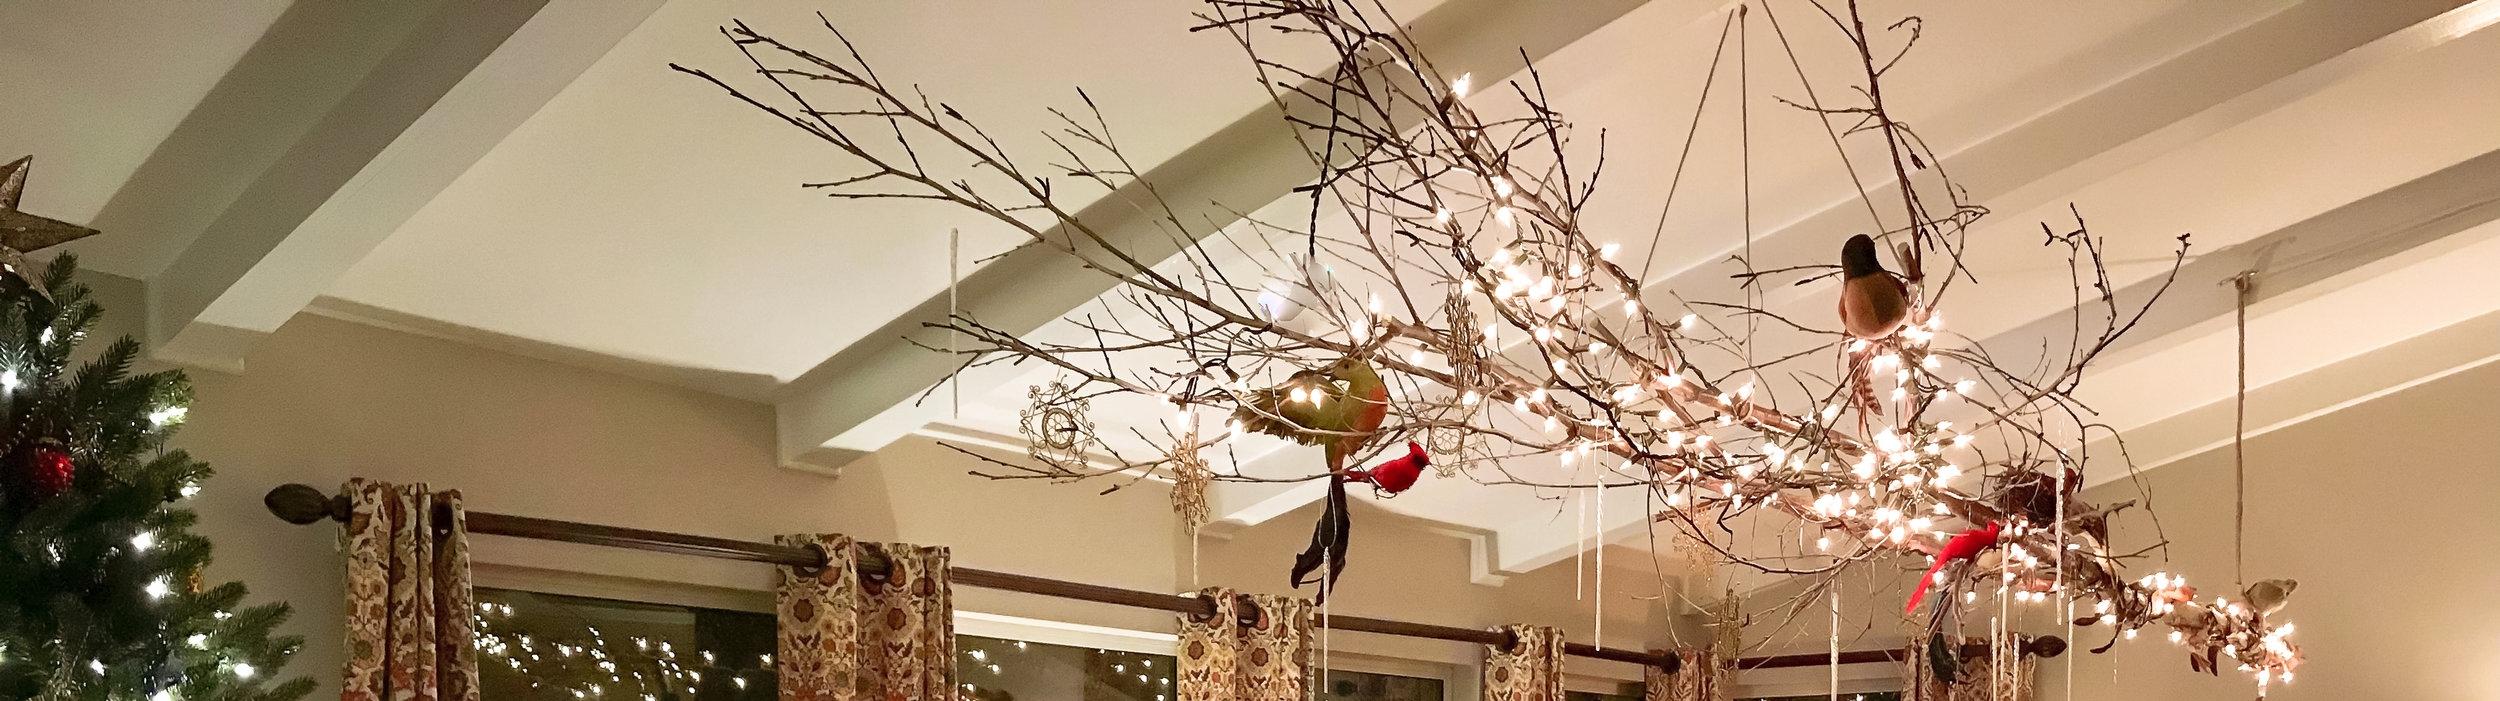 branch chandelier header.jpg